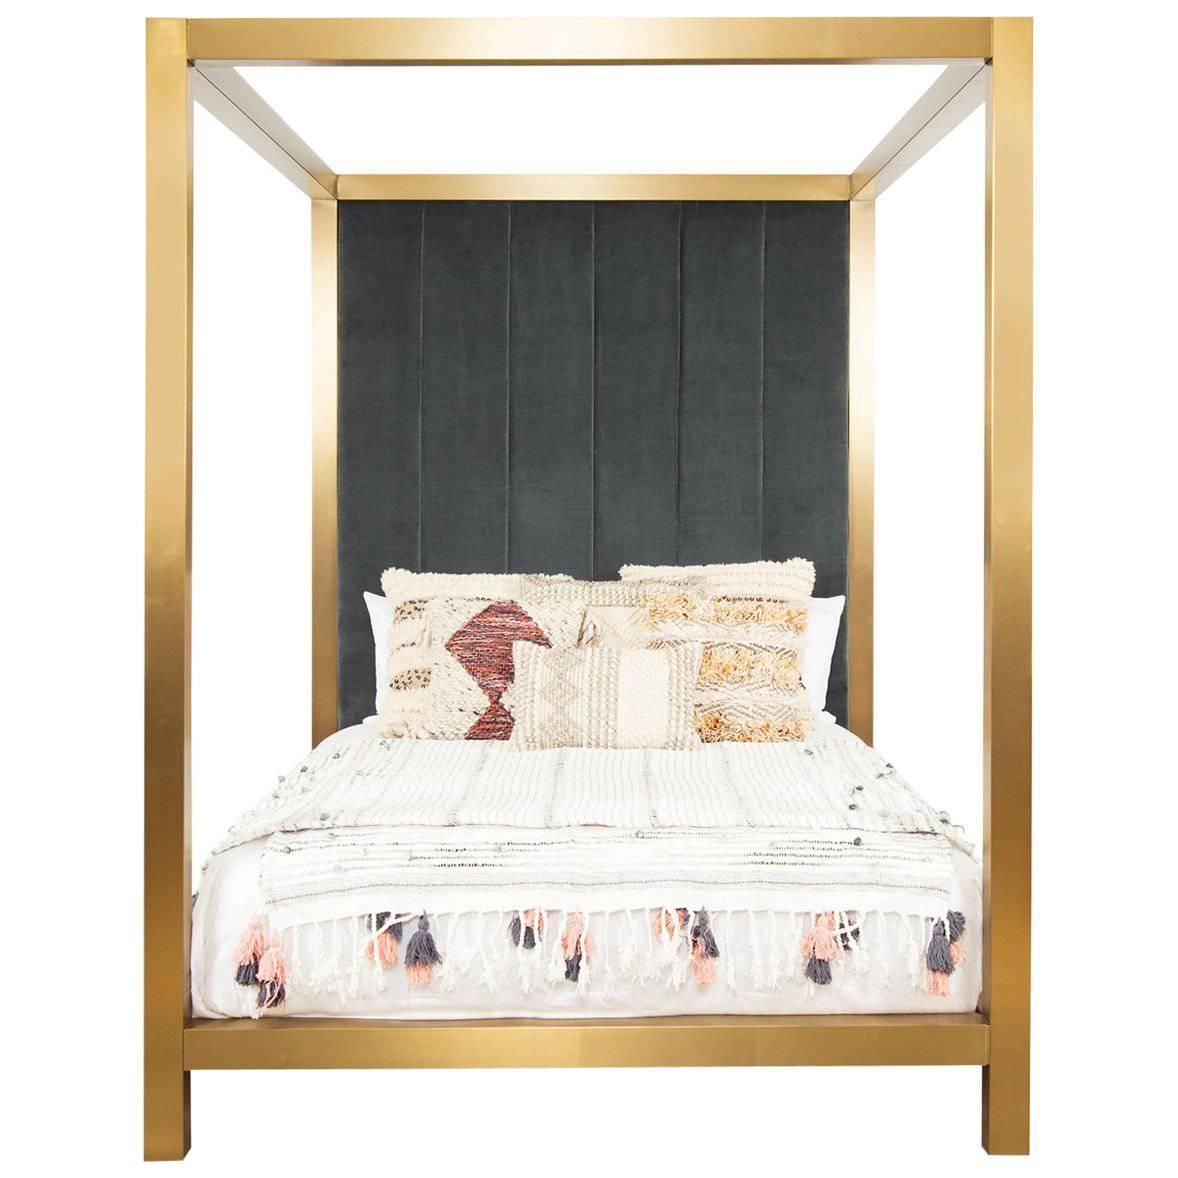 Modern Brushed Brass Four Poster Cal King Bed Channel Tufted Velvet Headboard For Sale At 1stdibs